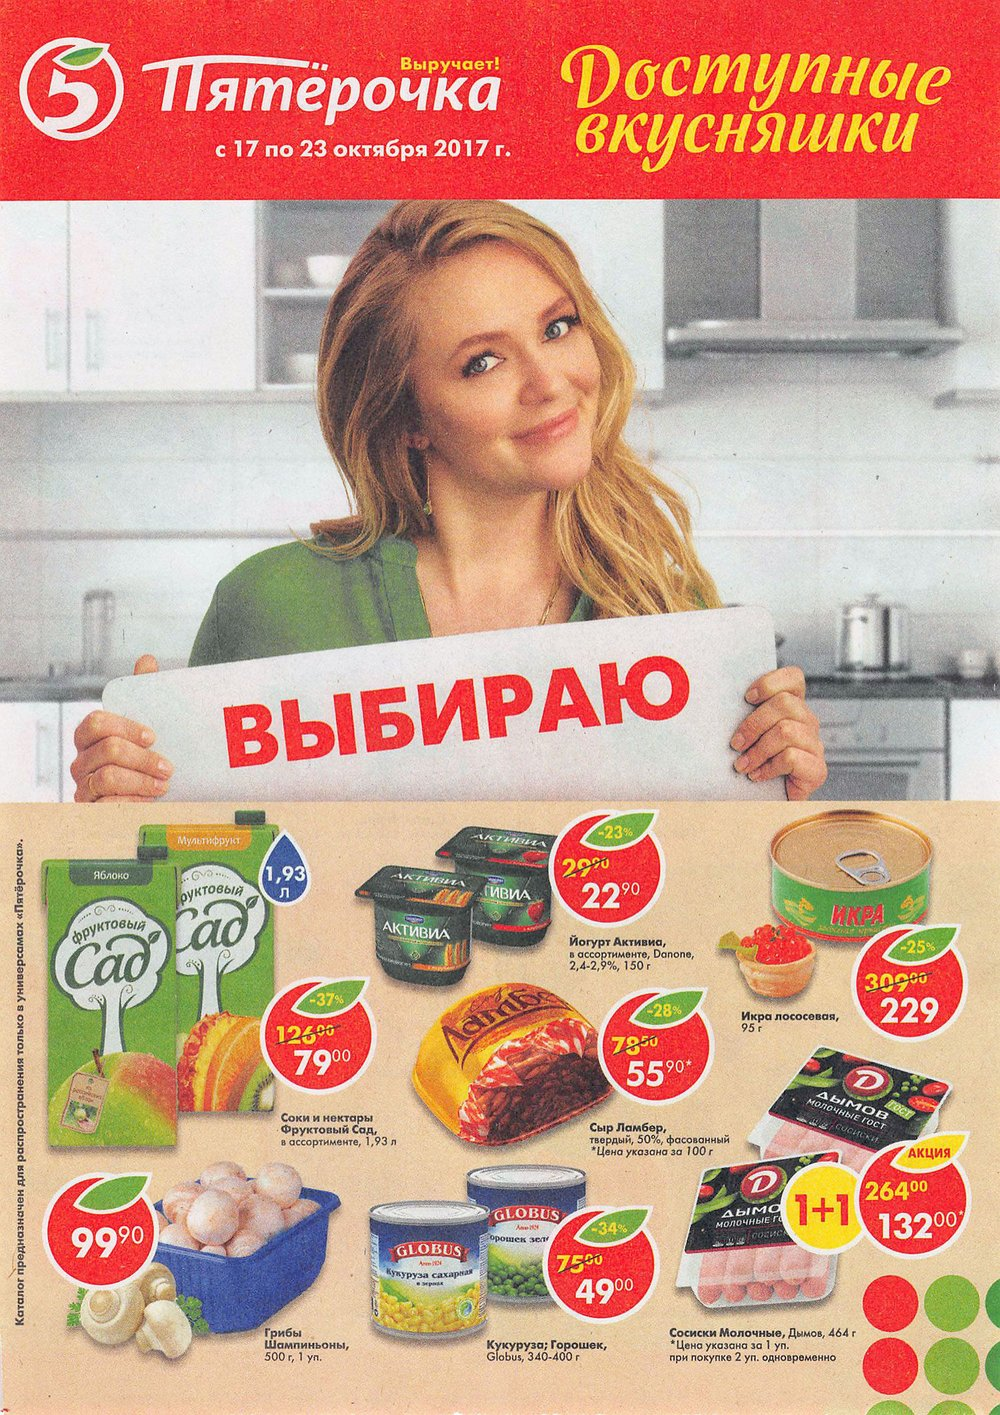 Каталог акций Пятерочка с 17 по 23 октября 2017 - стр. 1